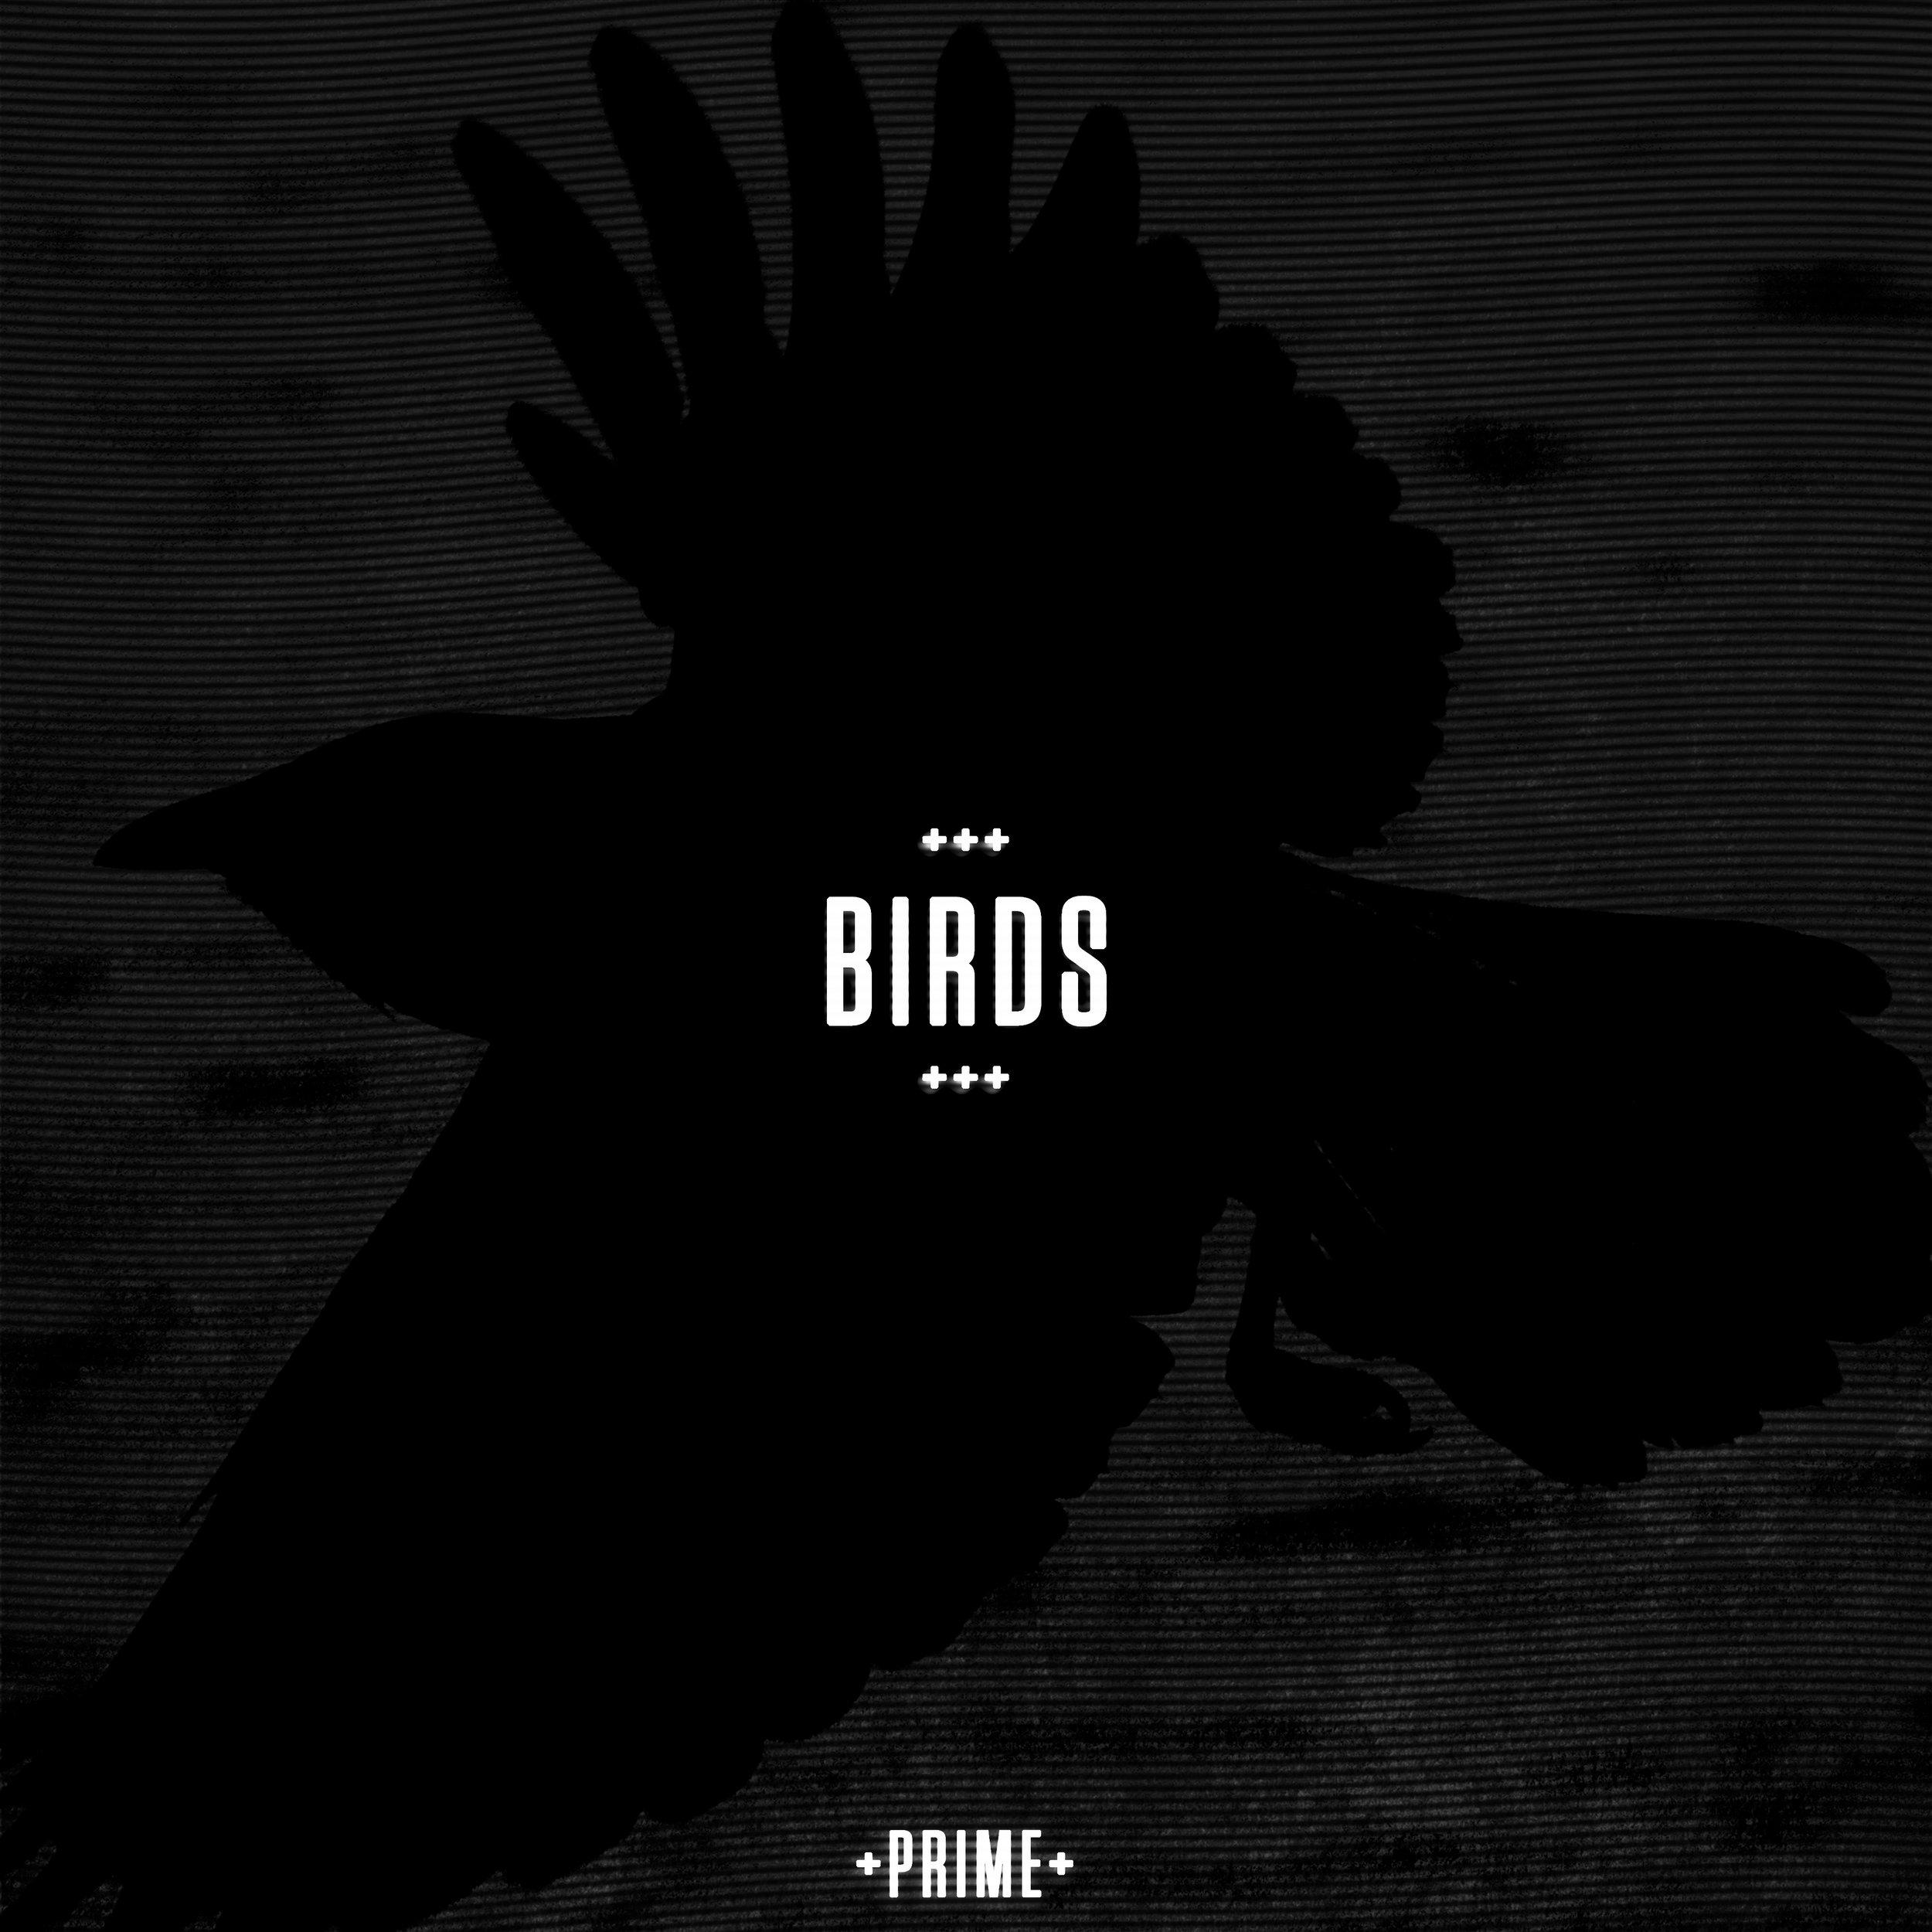 slow-graffiti-birds-artwork.jpg